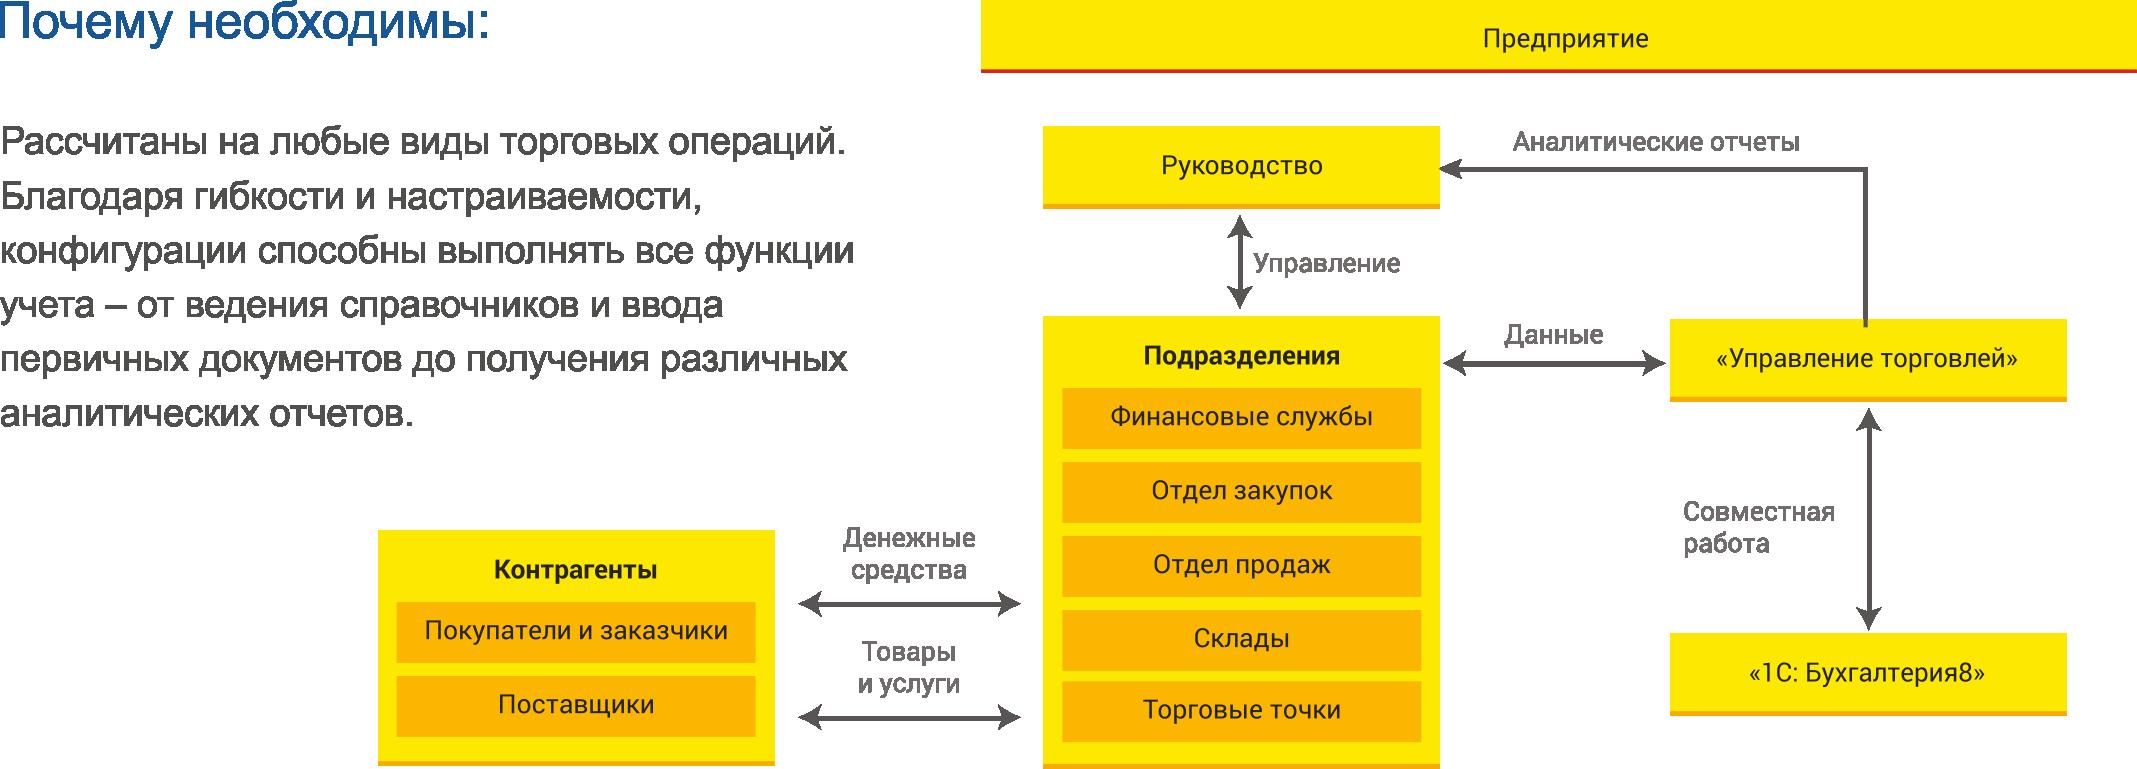 tablica_torg